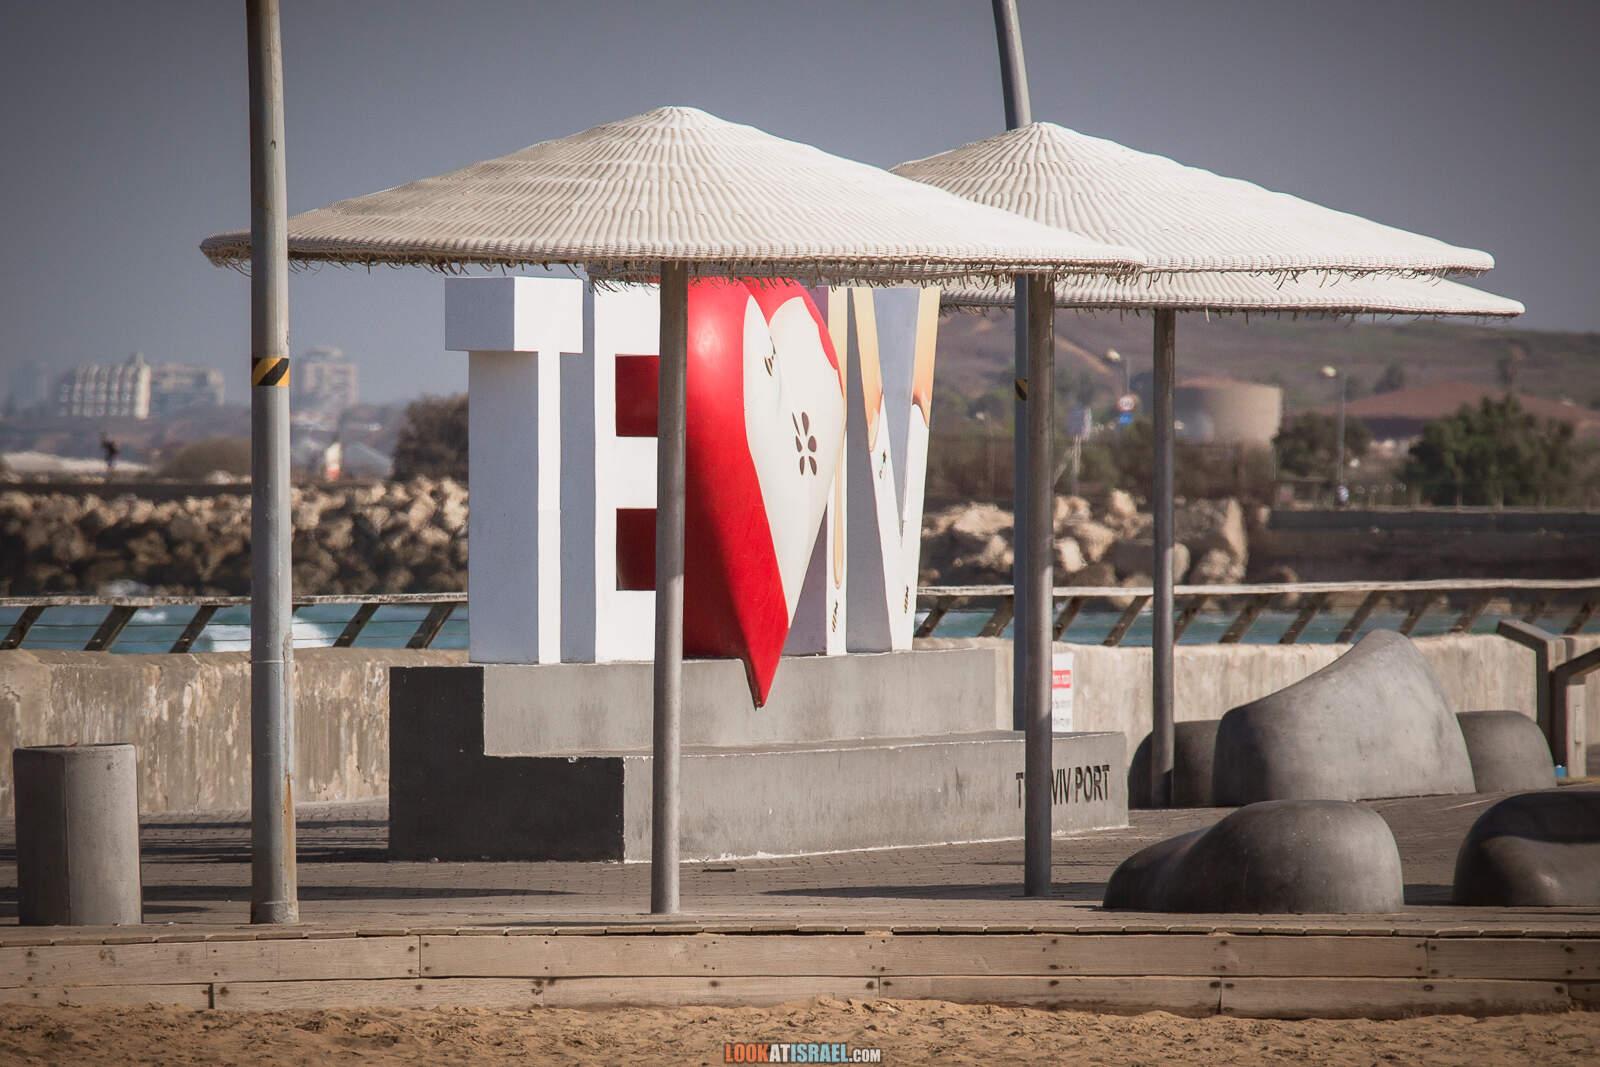 Порт Тель-Авива во время карантина | Lockdown in port of Tel Aviv | LookAtIsrael.com - Фото путешествия по Израилю